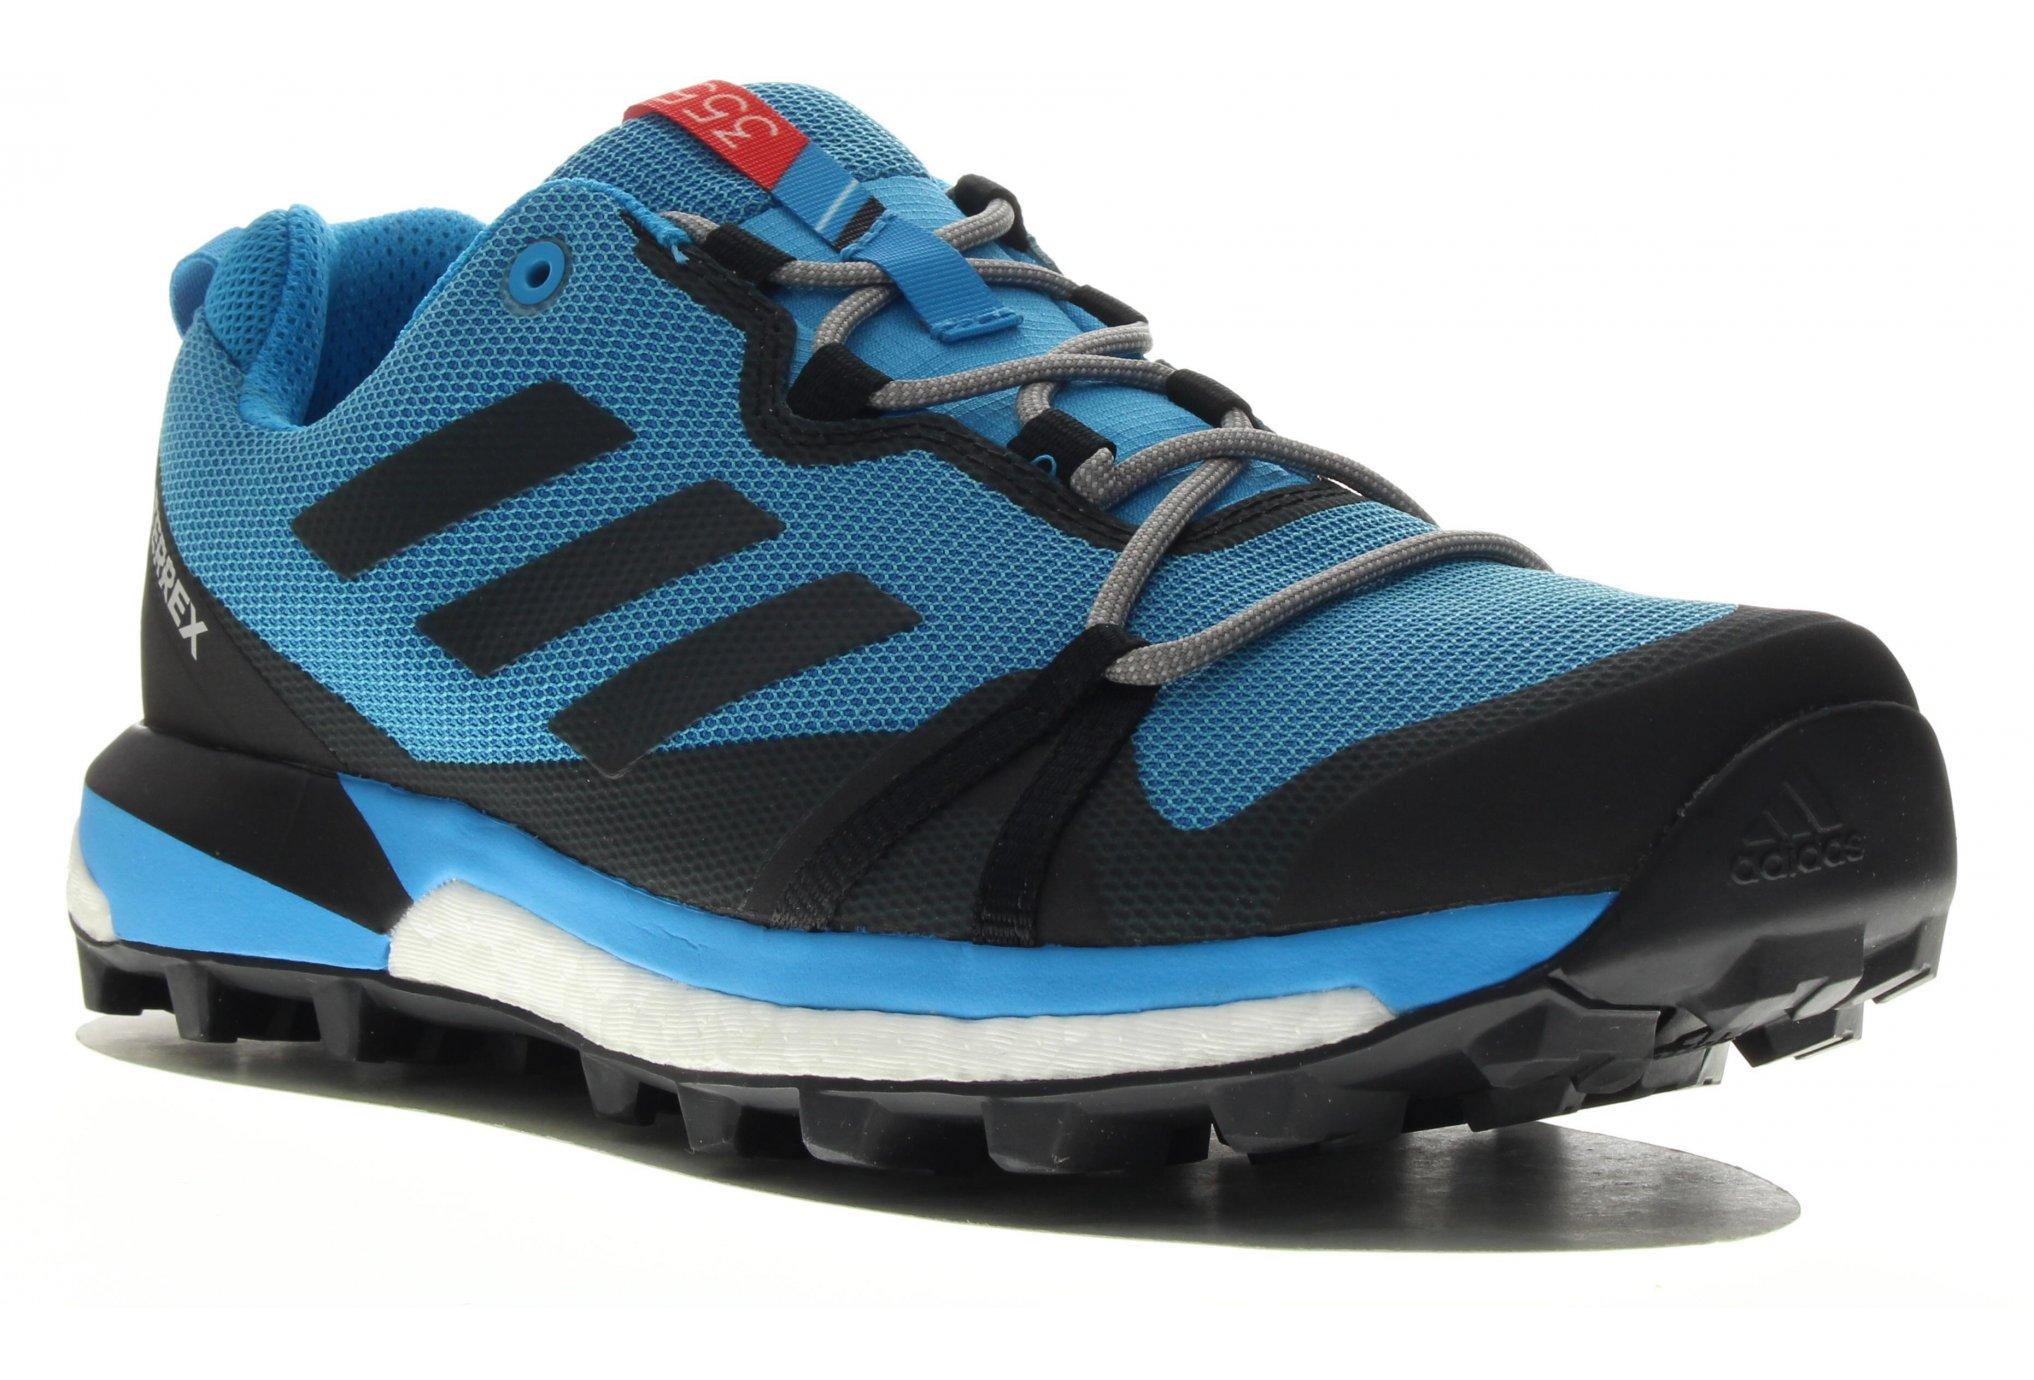 adidas Terrex Skychaser LT Gore-Tex M Diététique Chaussures homme